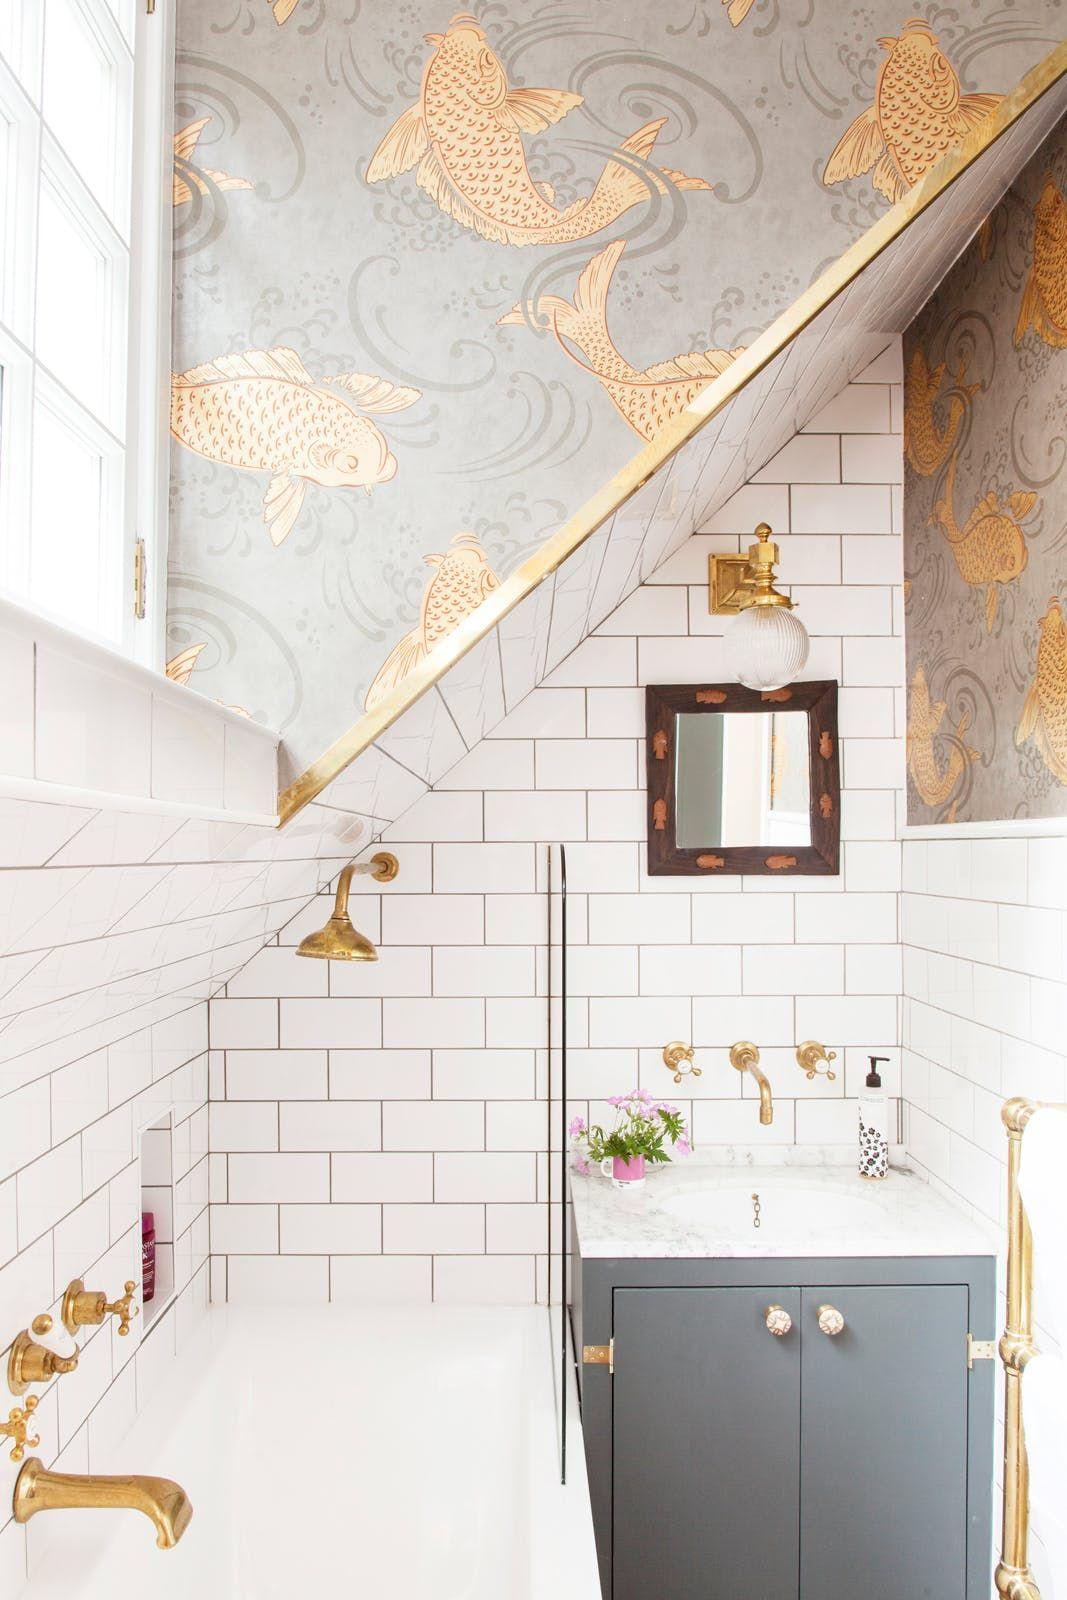 20 Bathroom Trends That Will Be Huge in 2017 | Pink houses, Bathroom ...